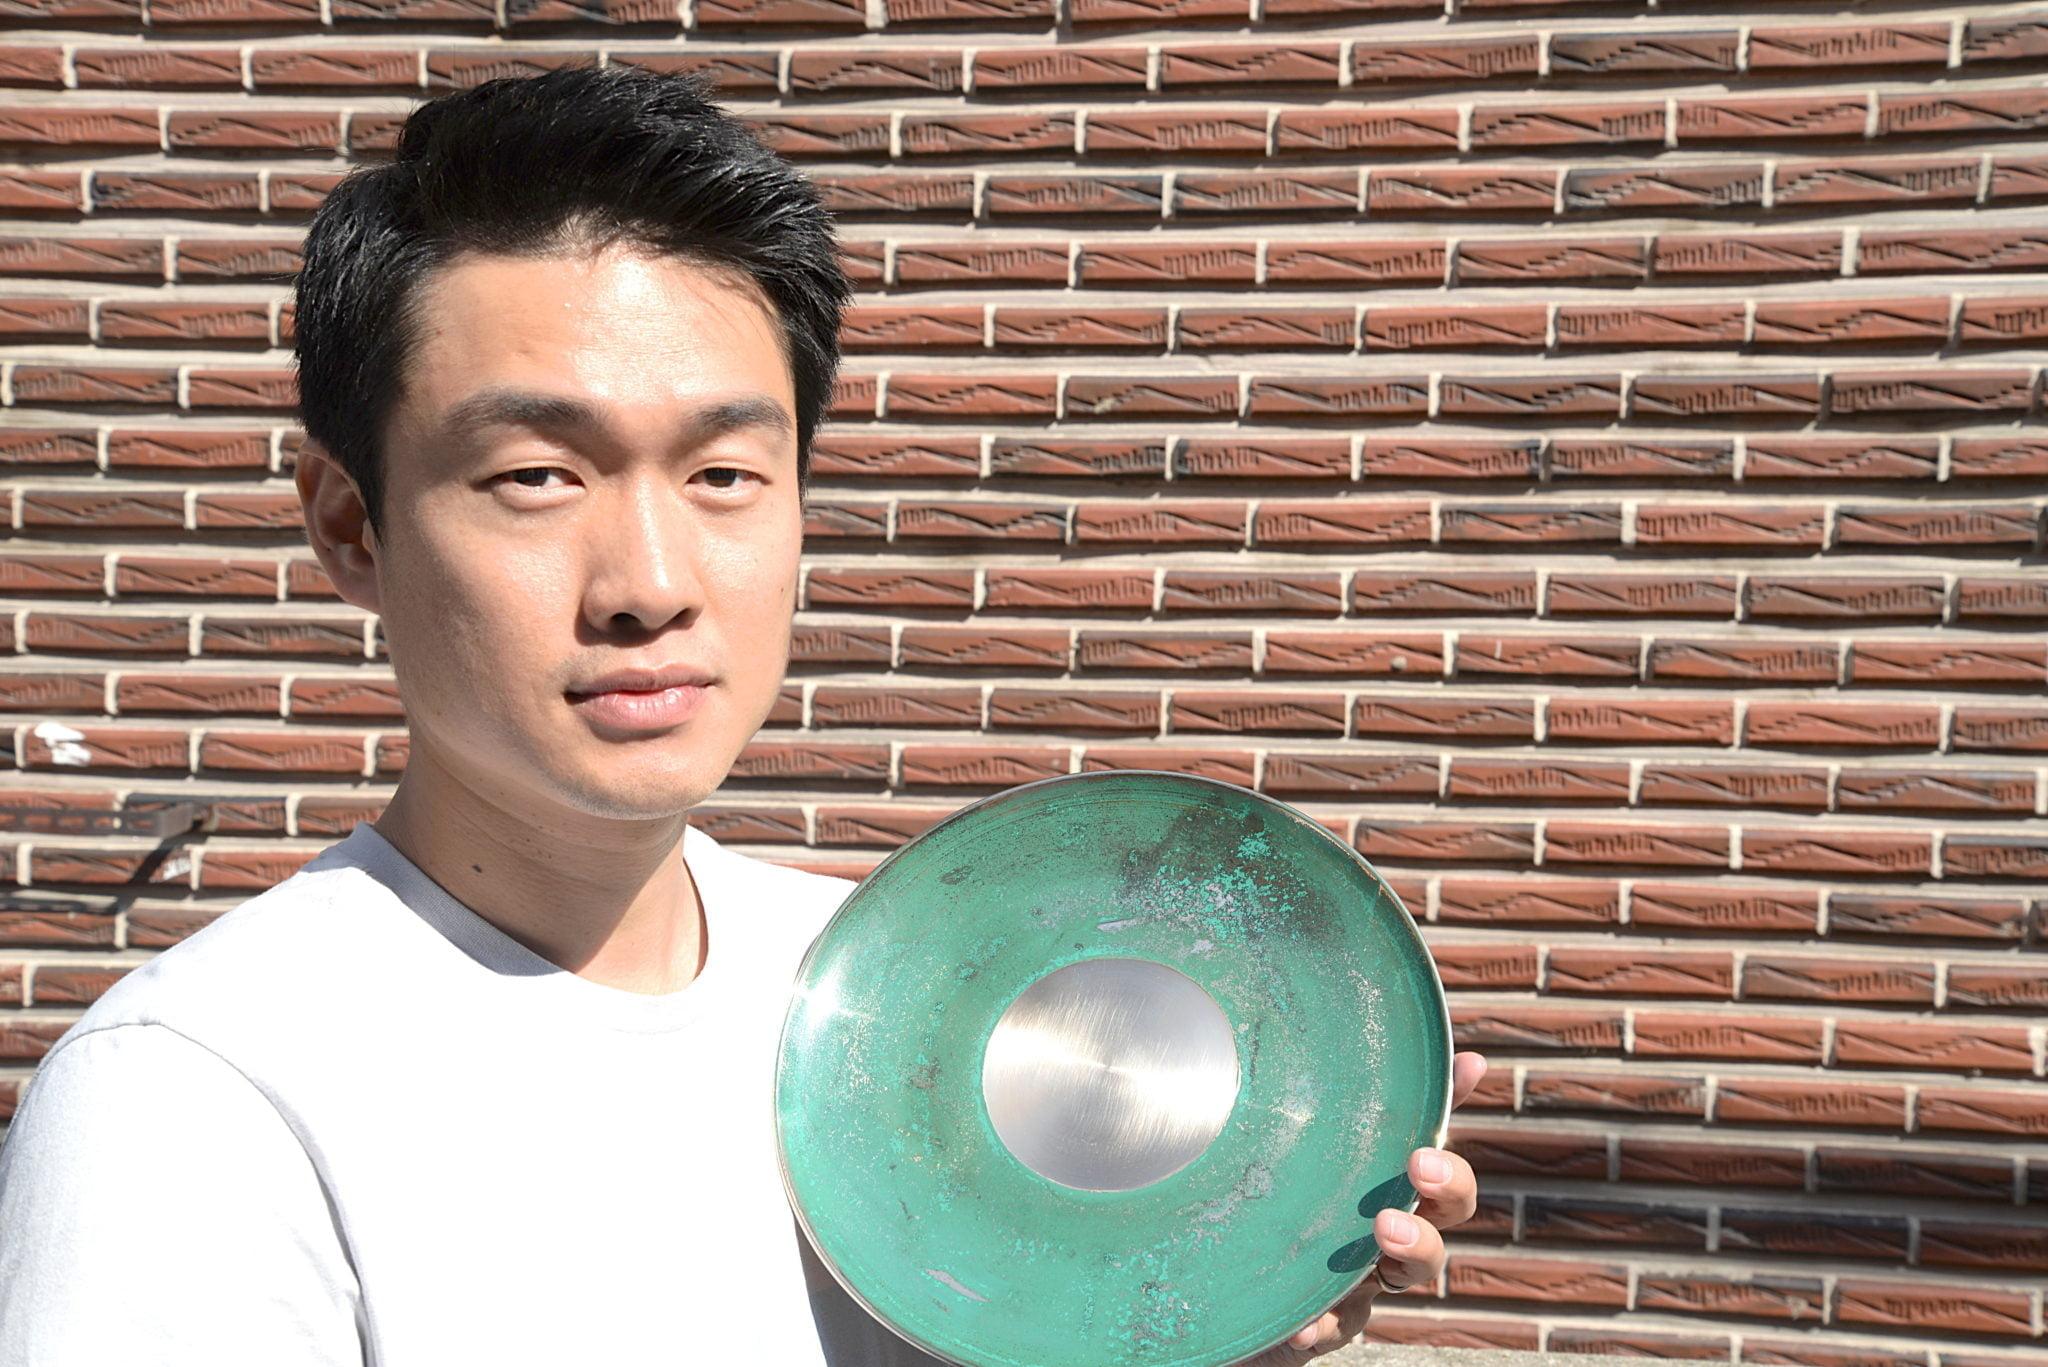 Hyuck Yi, directeur de l'atelier coréen Geochang Yugi